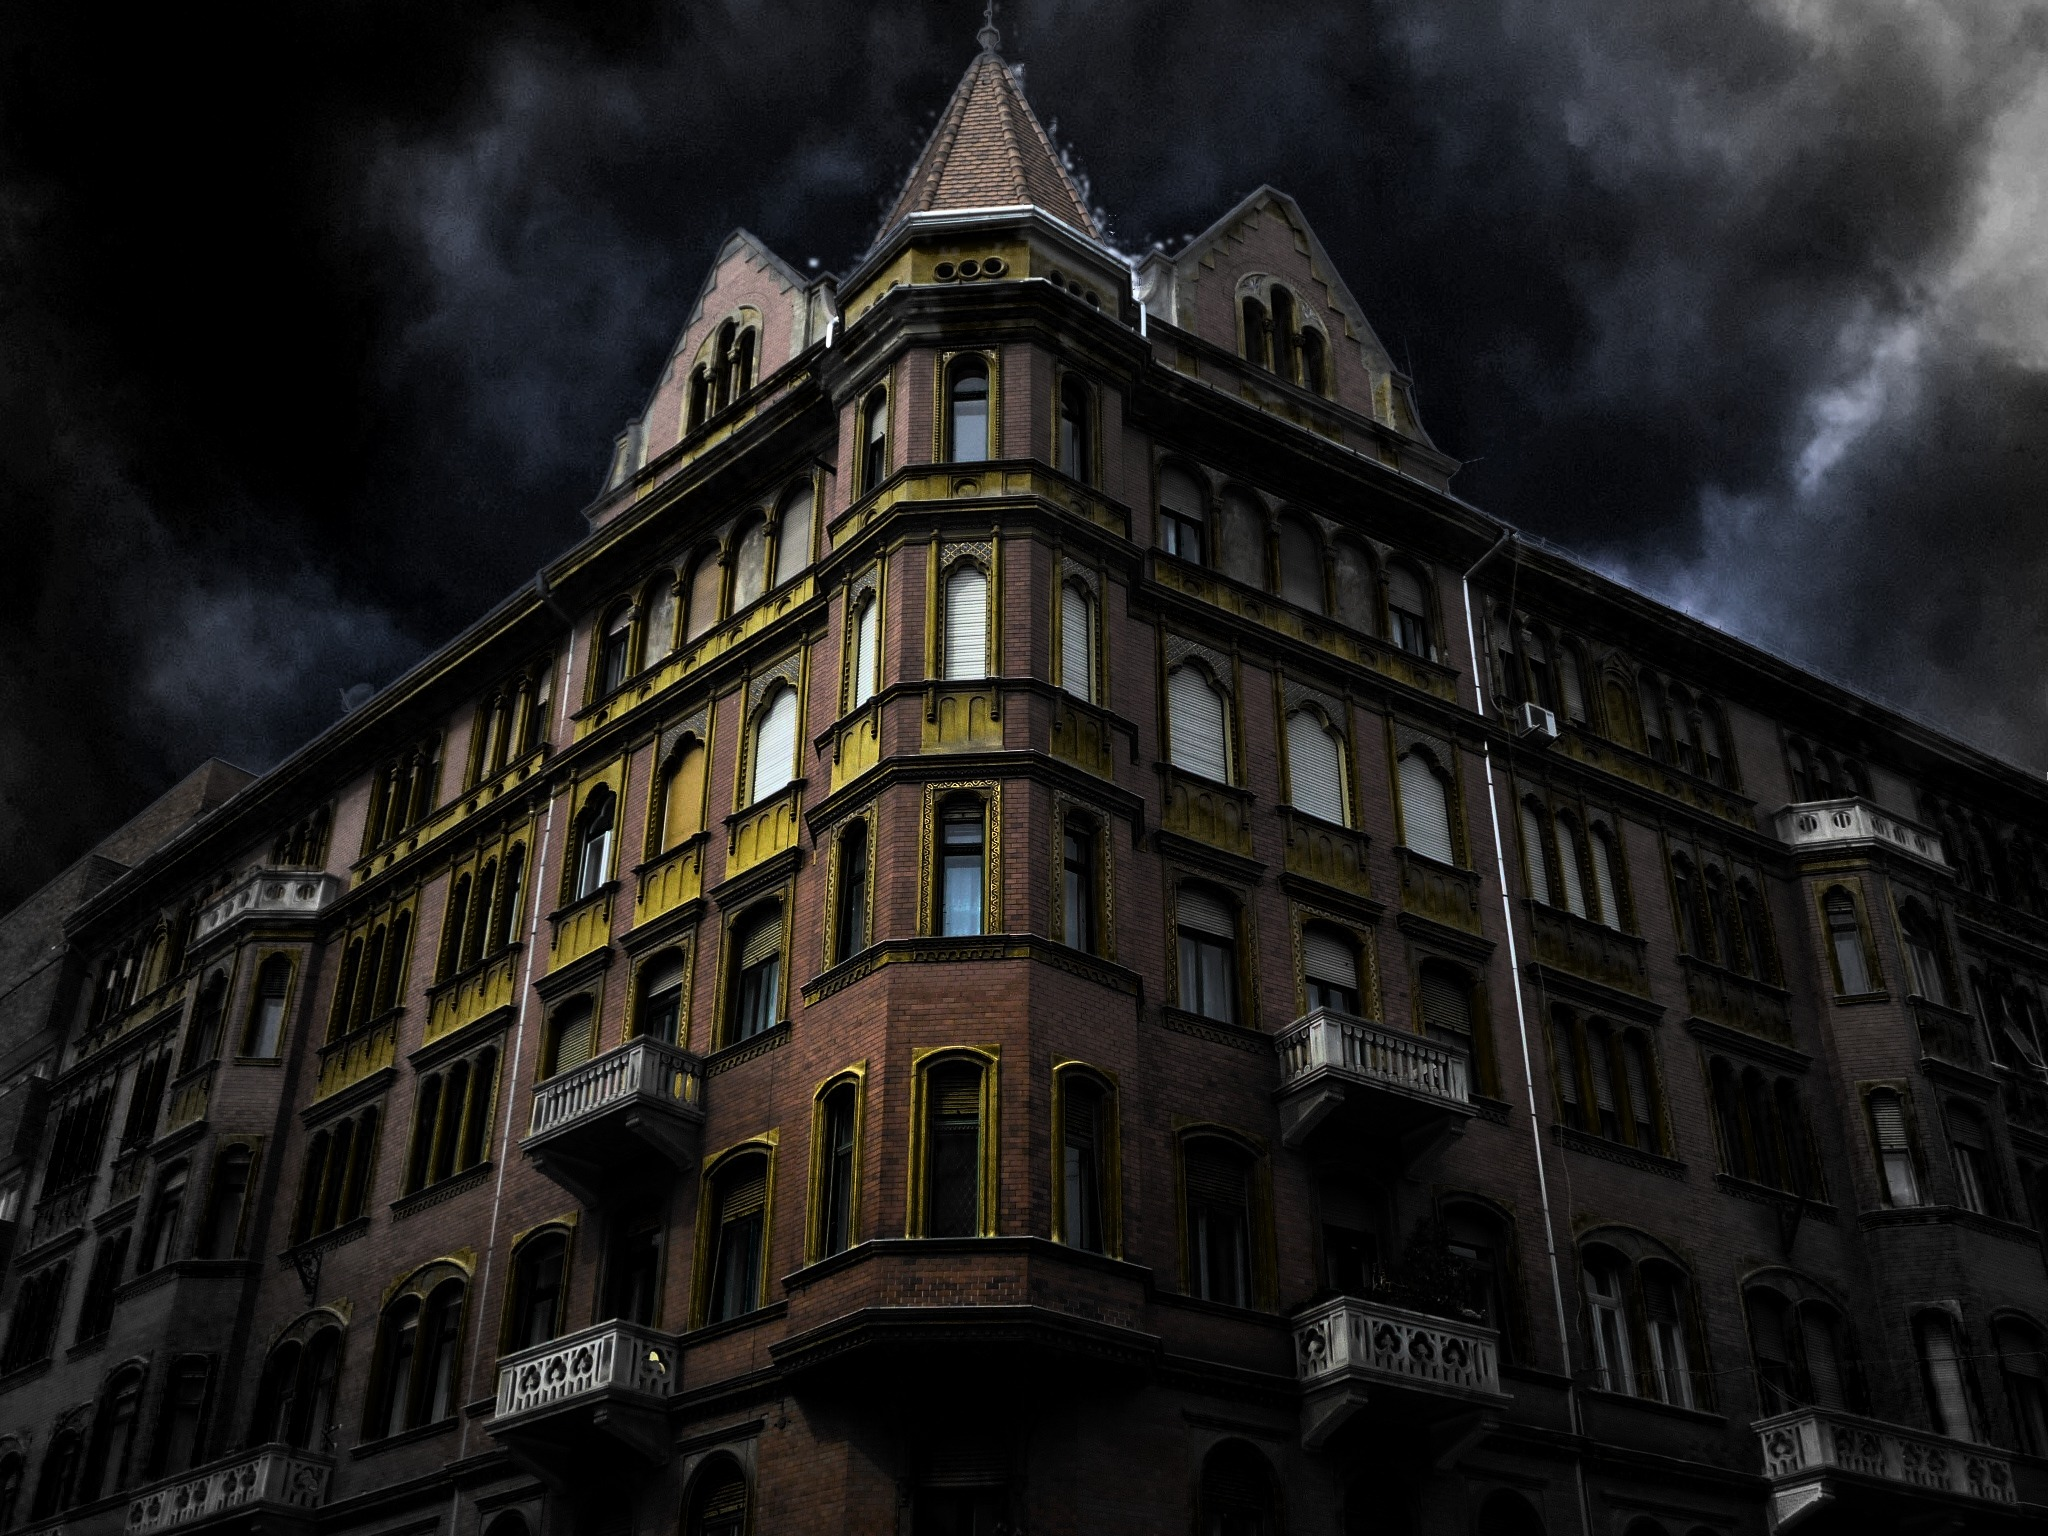 haunted-house-corner-200065.jpg